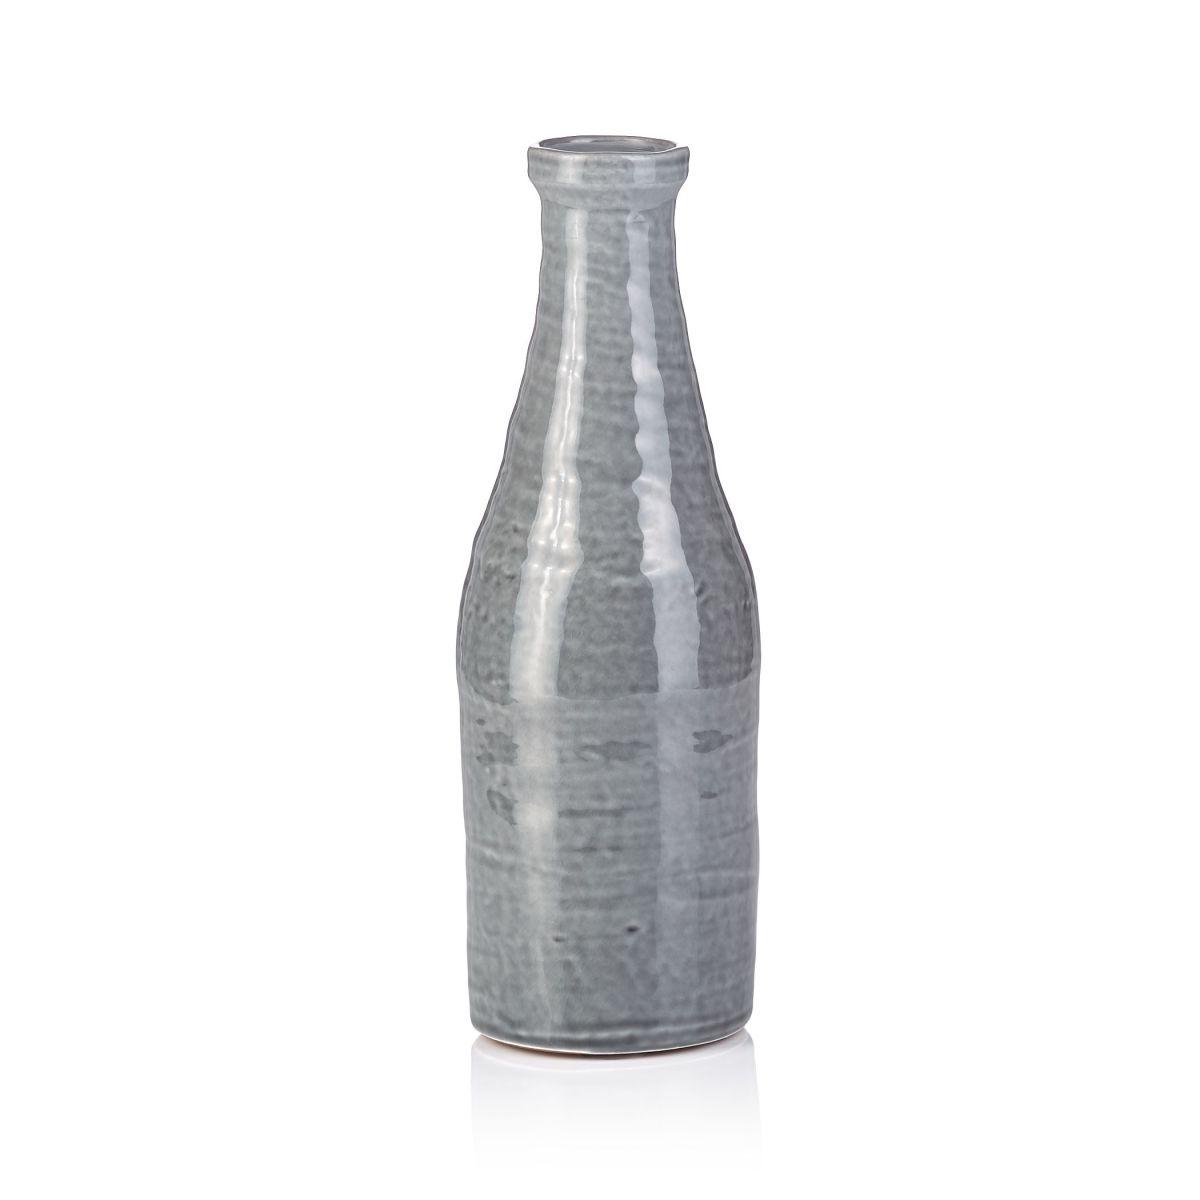 Deko-Karaffe, rustikal, Keramik, glasiert